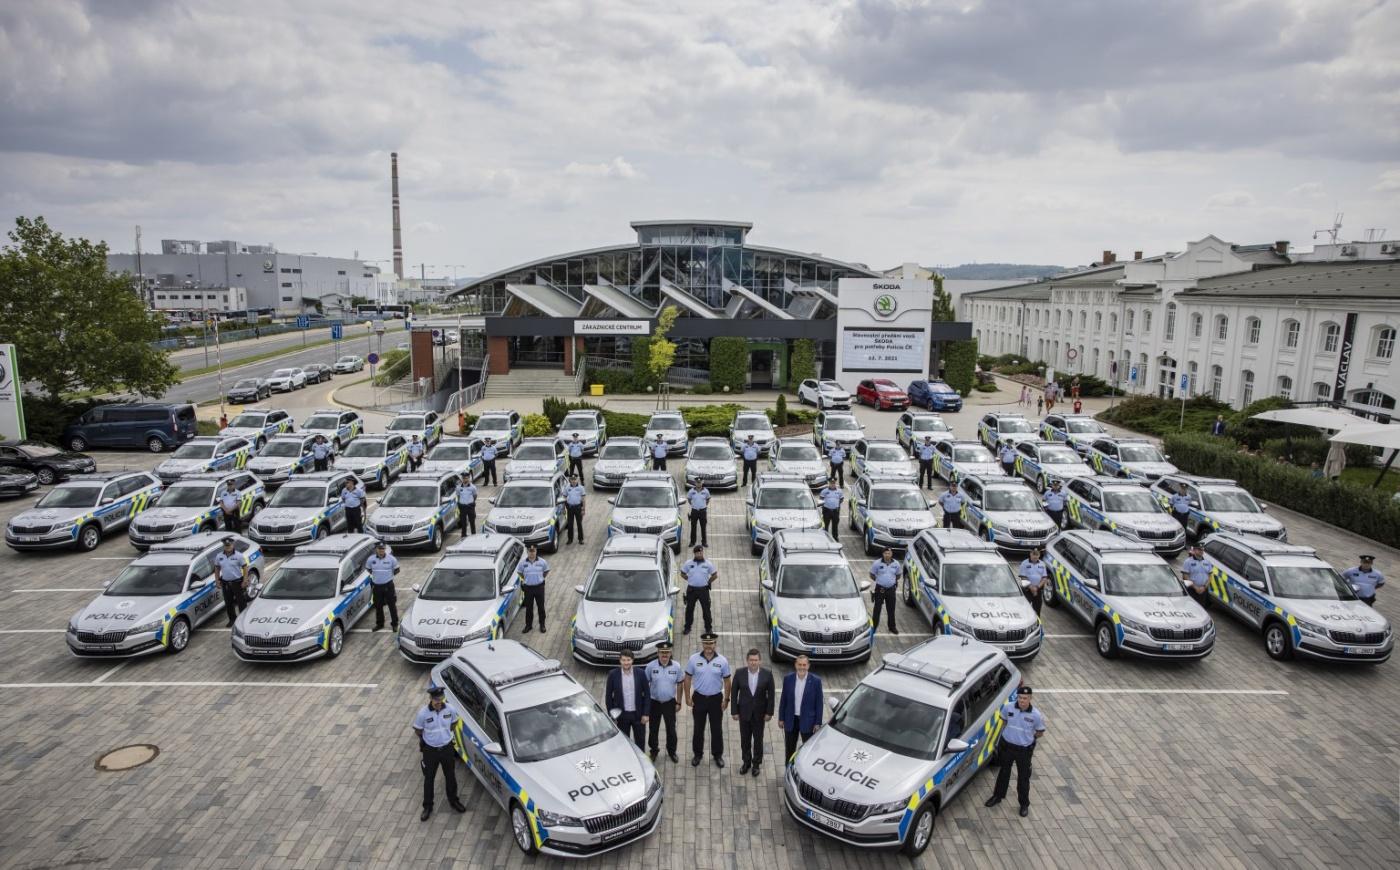 flotila police ČR